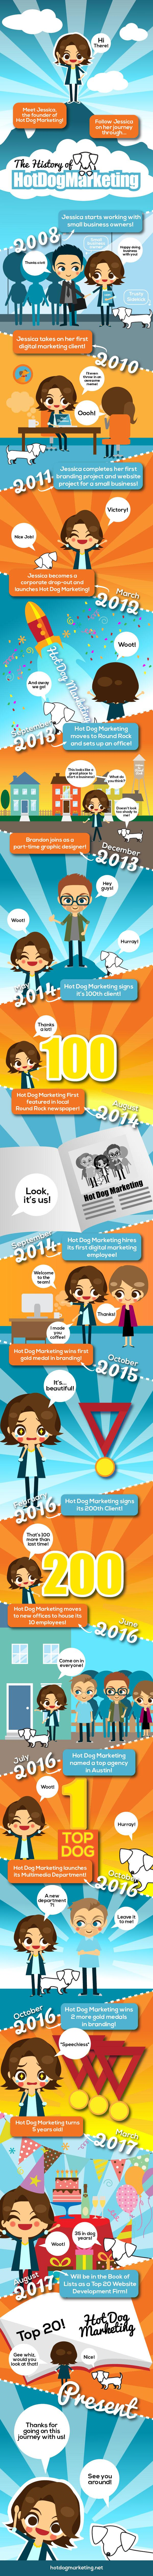 The History of Hot Dog Marketing